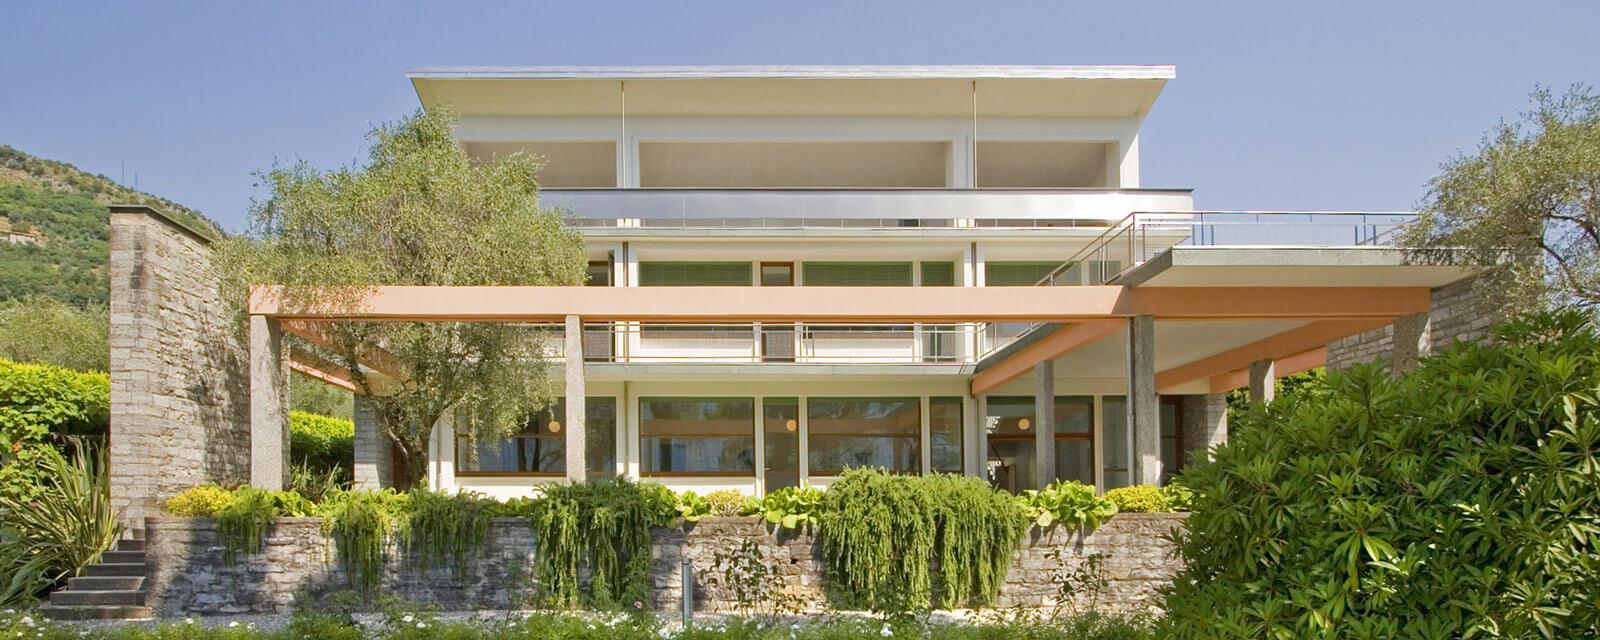 villa ossucio luxus ferienhaus am comer see mieten landmark. Black Bedroom Furniture Sets. Home Design Ideas